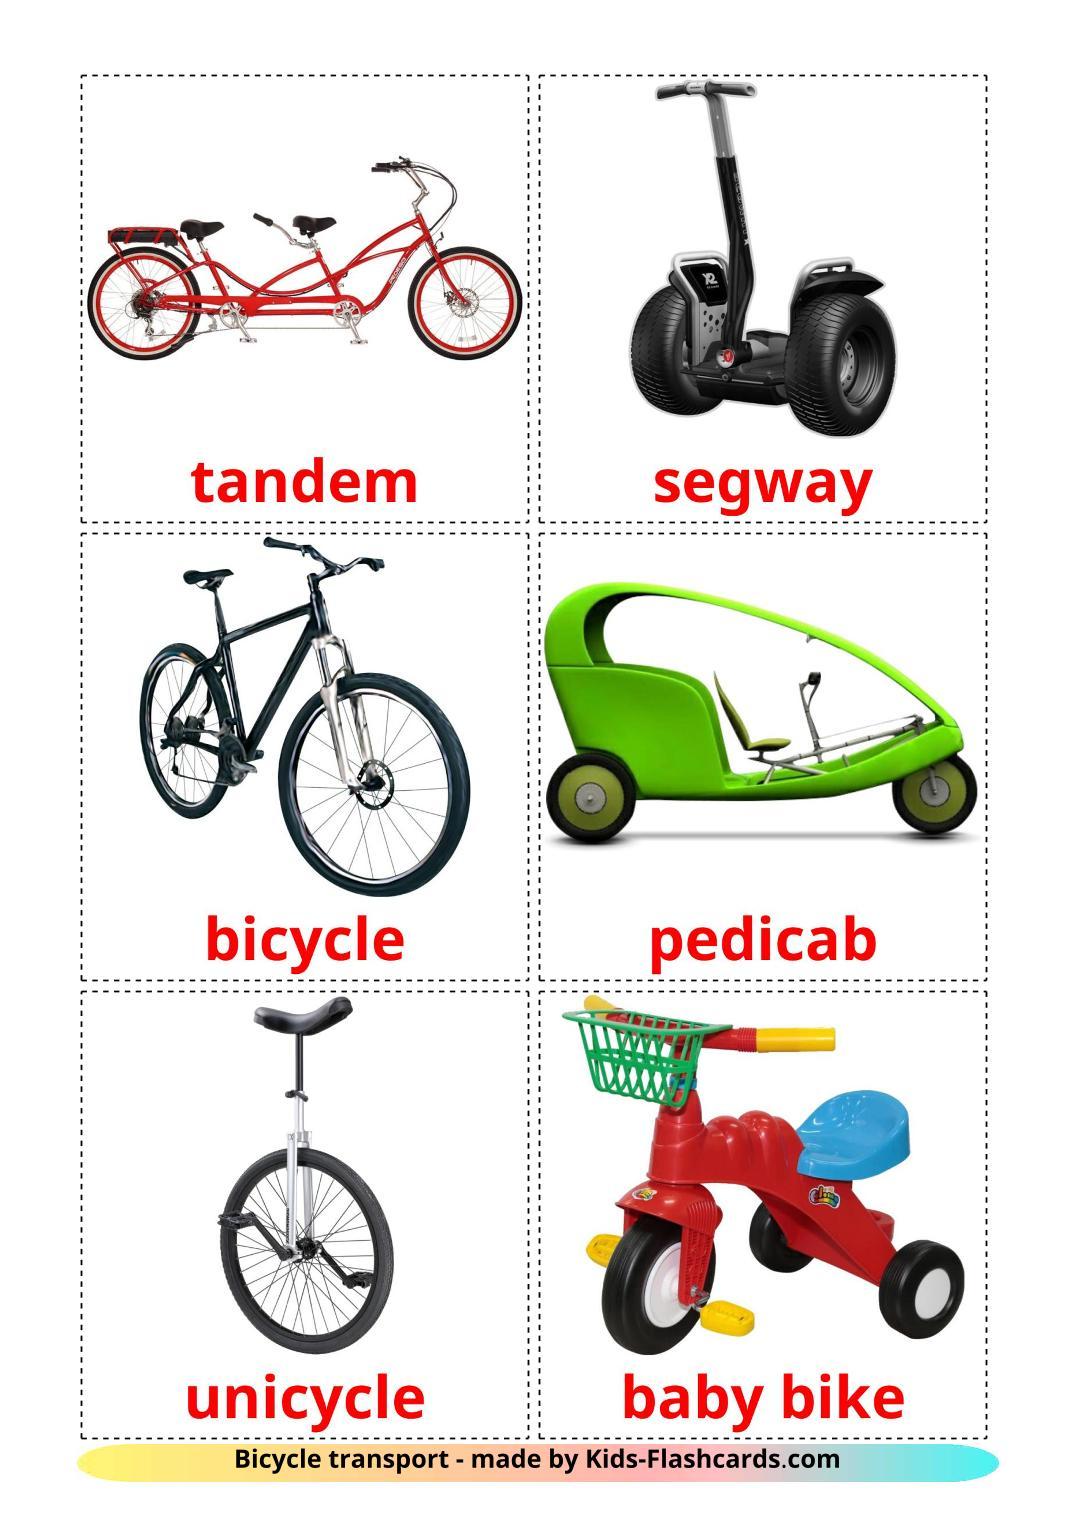 Bicycle transport - 16 Free Printable english Flashcards